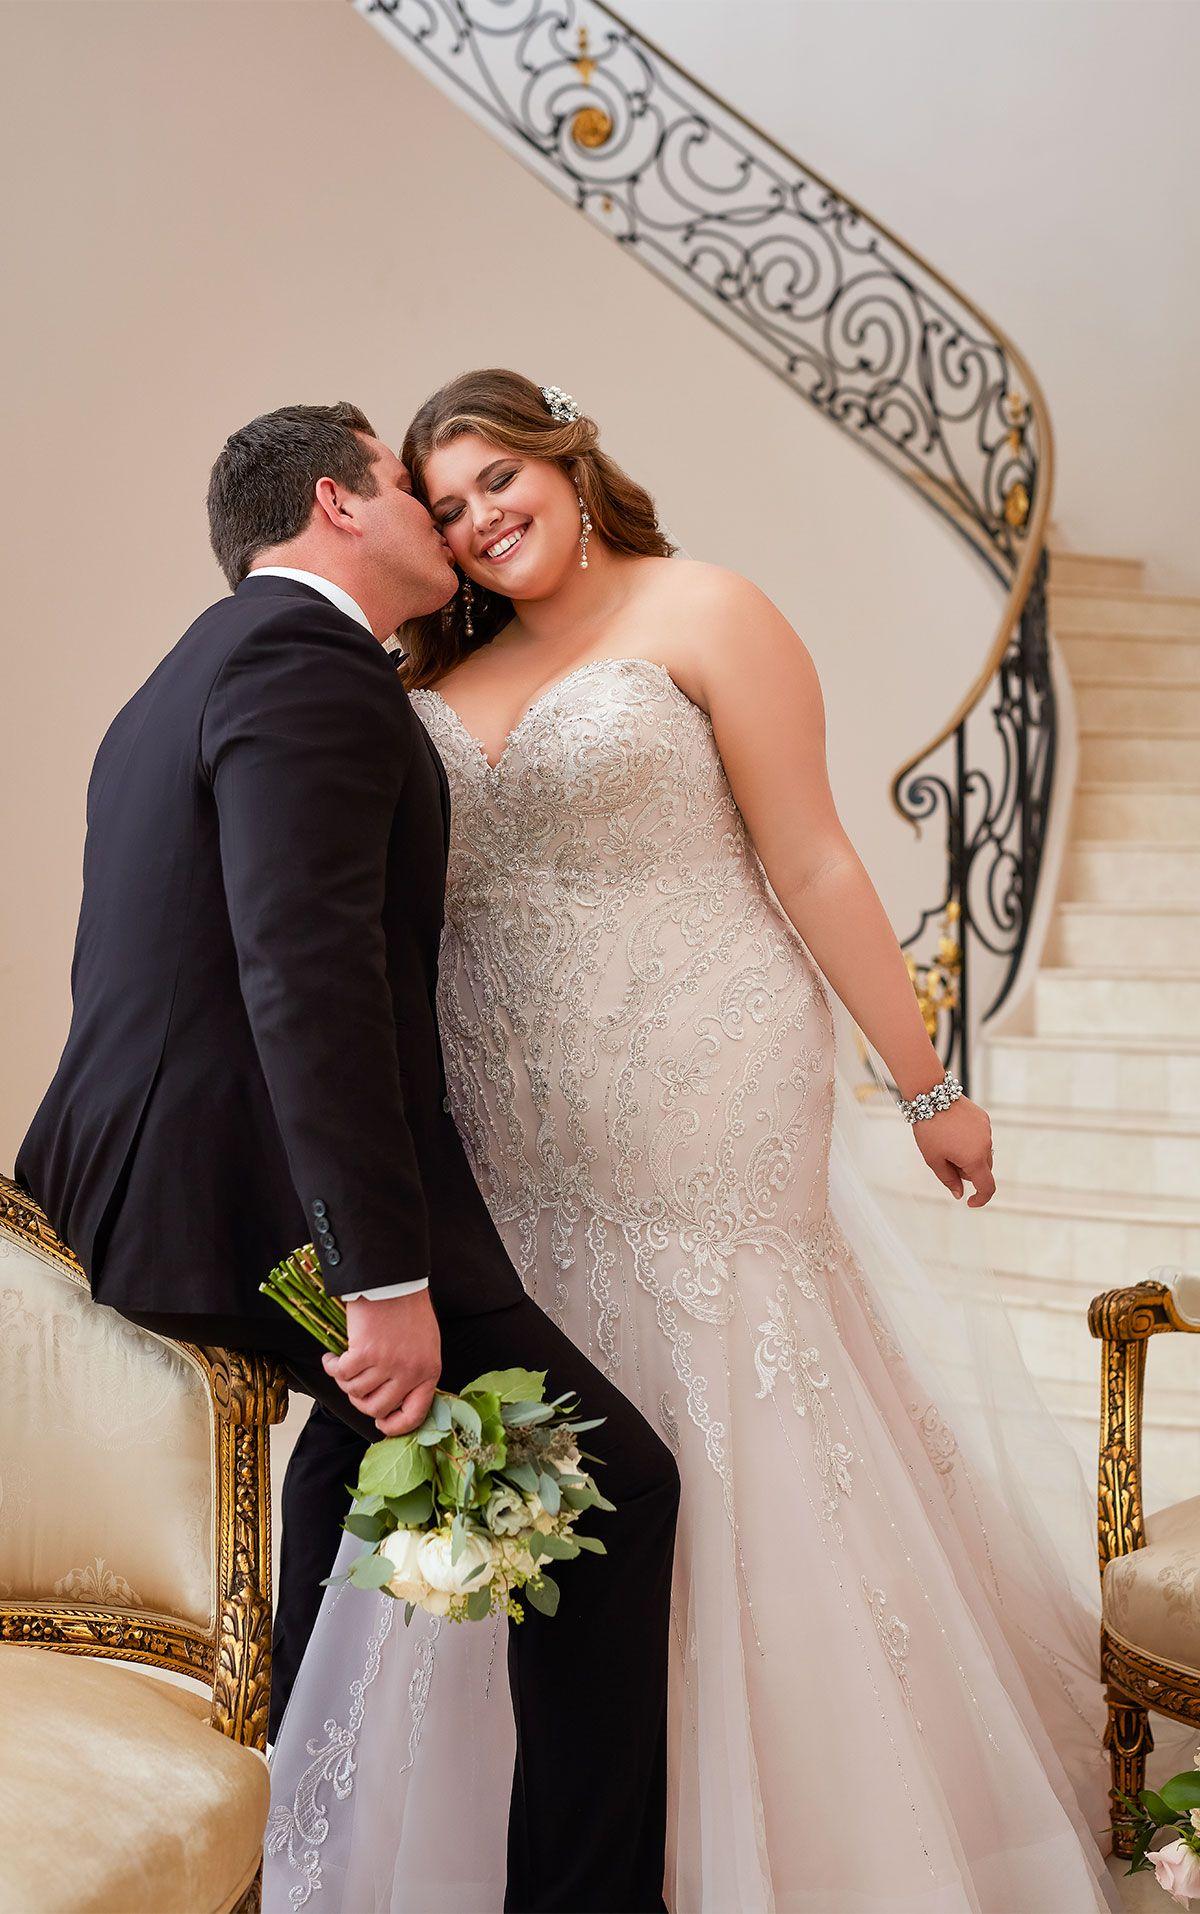 Mermaid Wedding Dress with Glamorous Lace Sell wedding